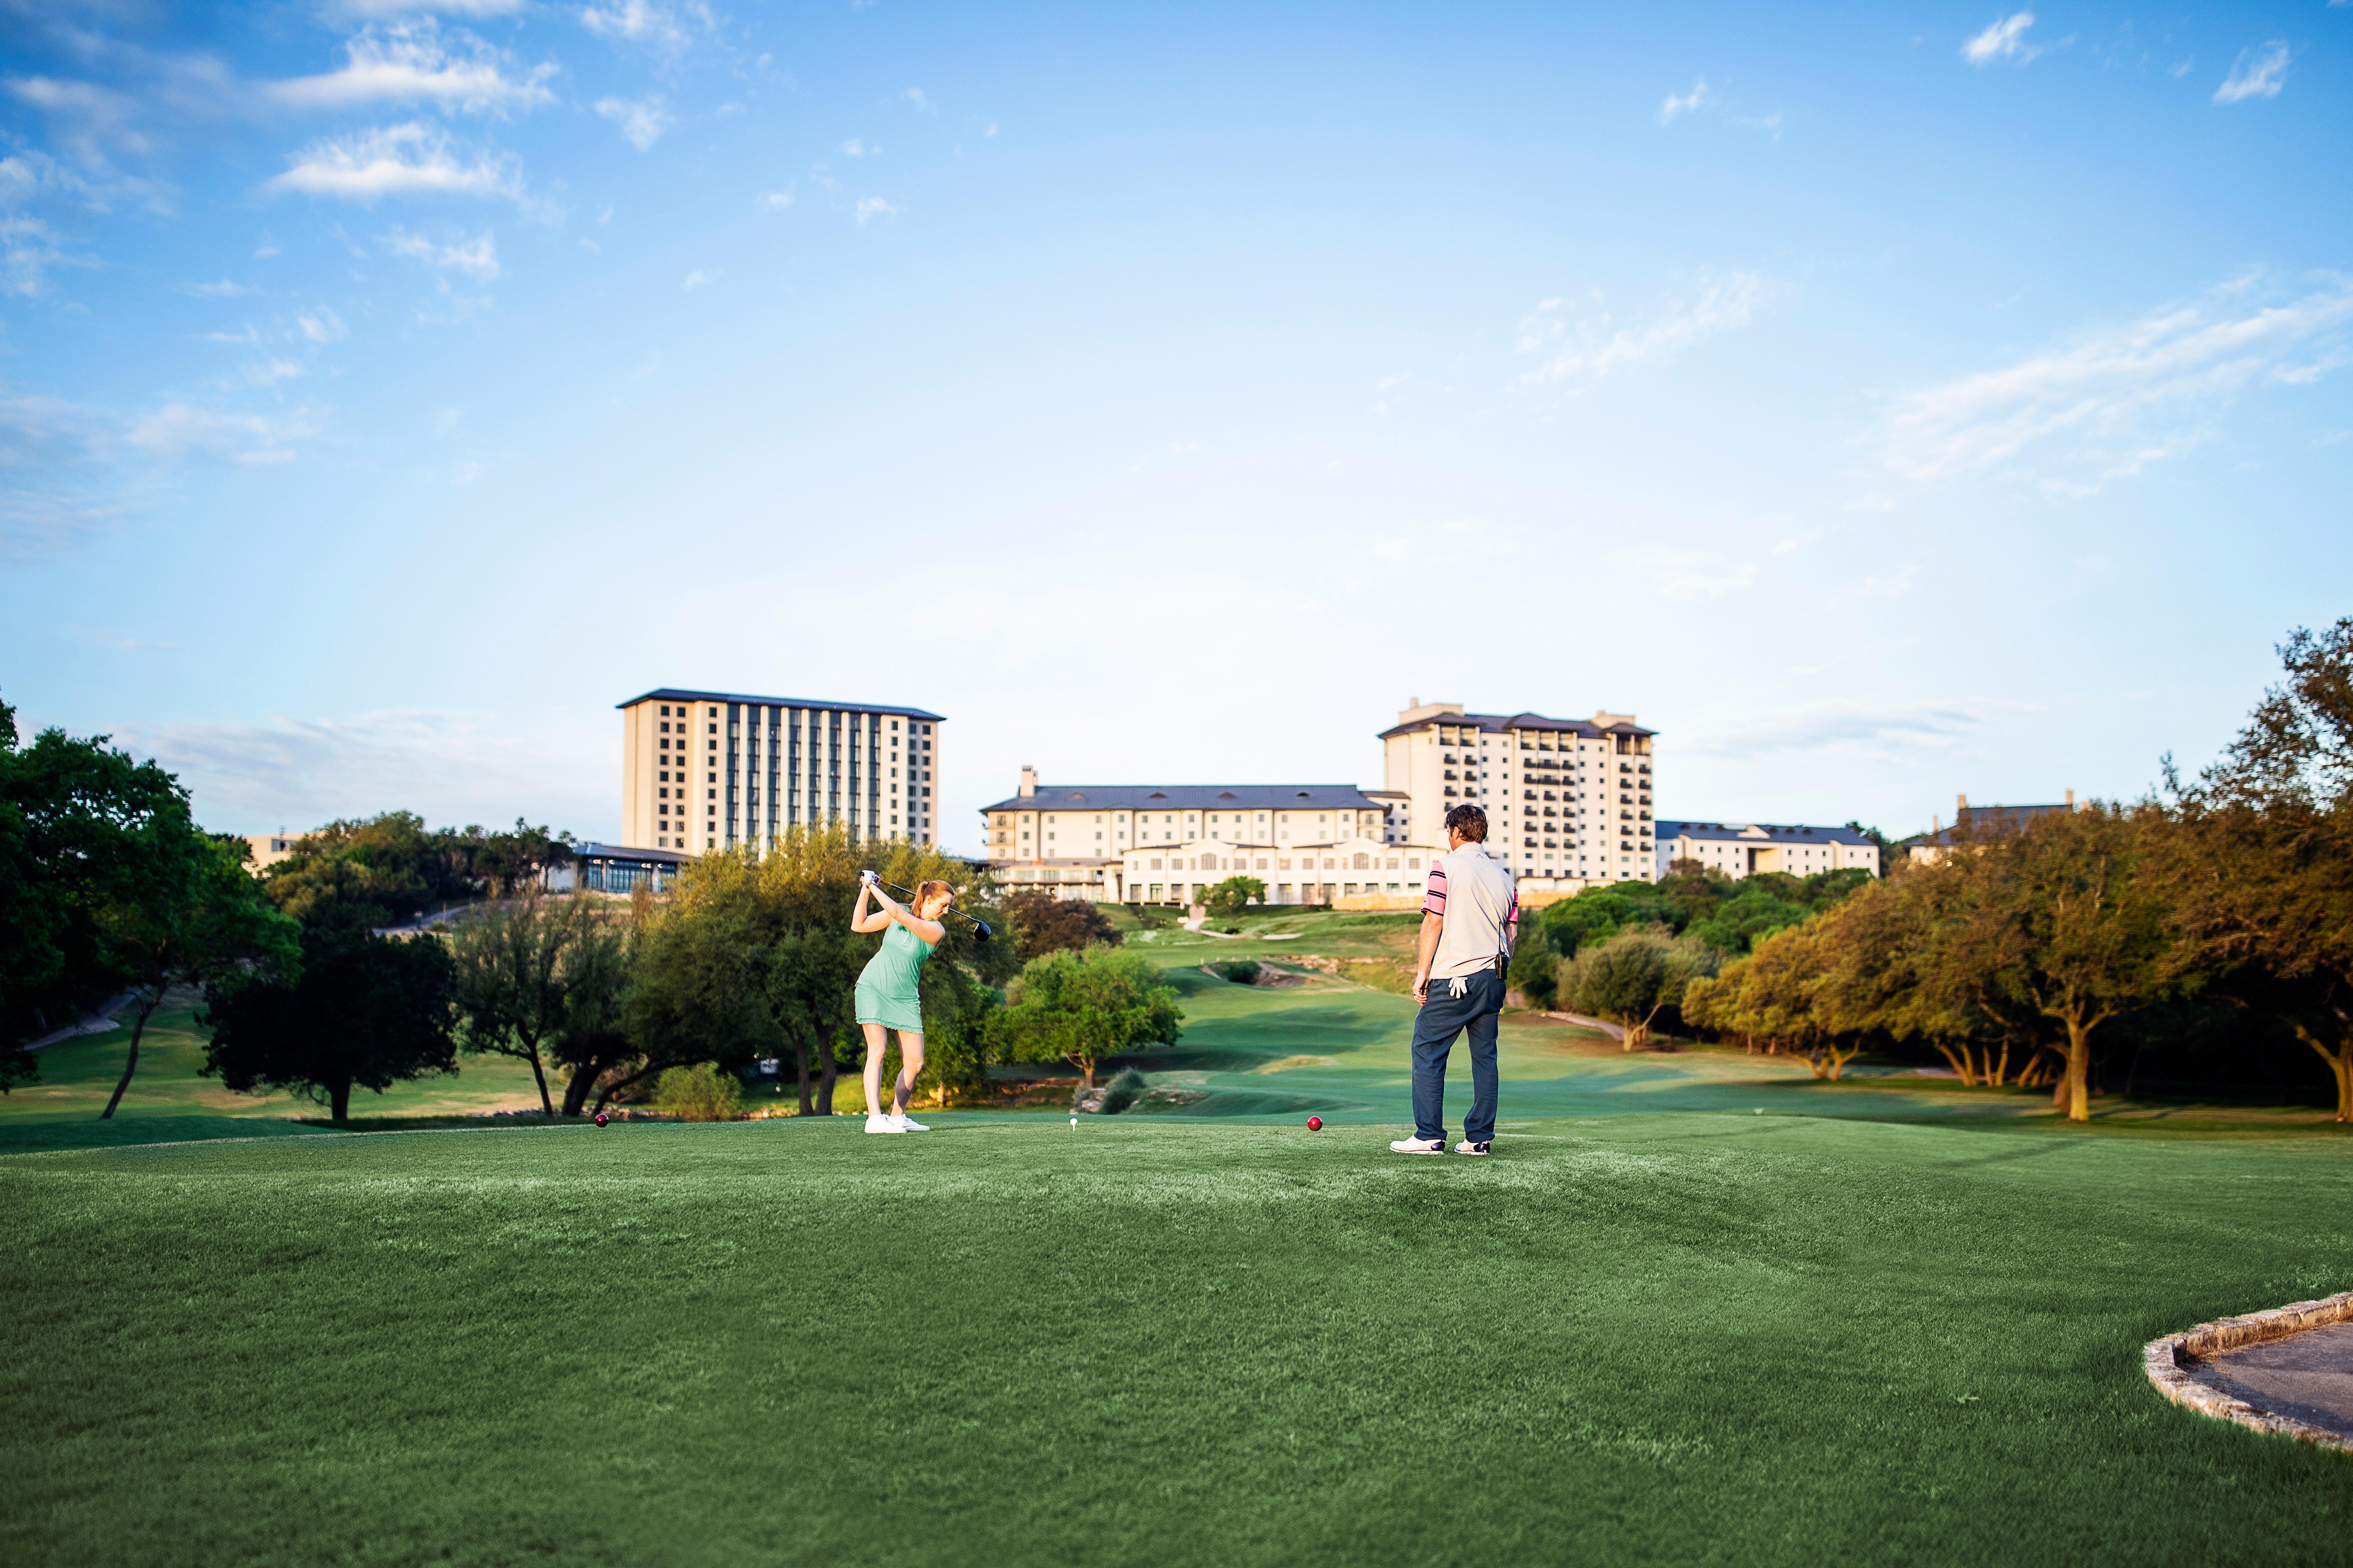 playing golf at Omni Barton Creek